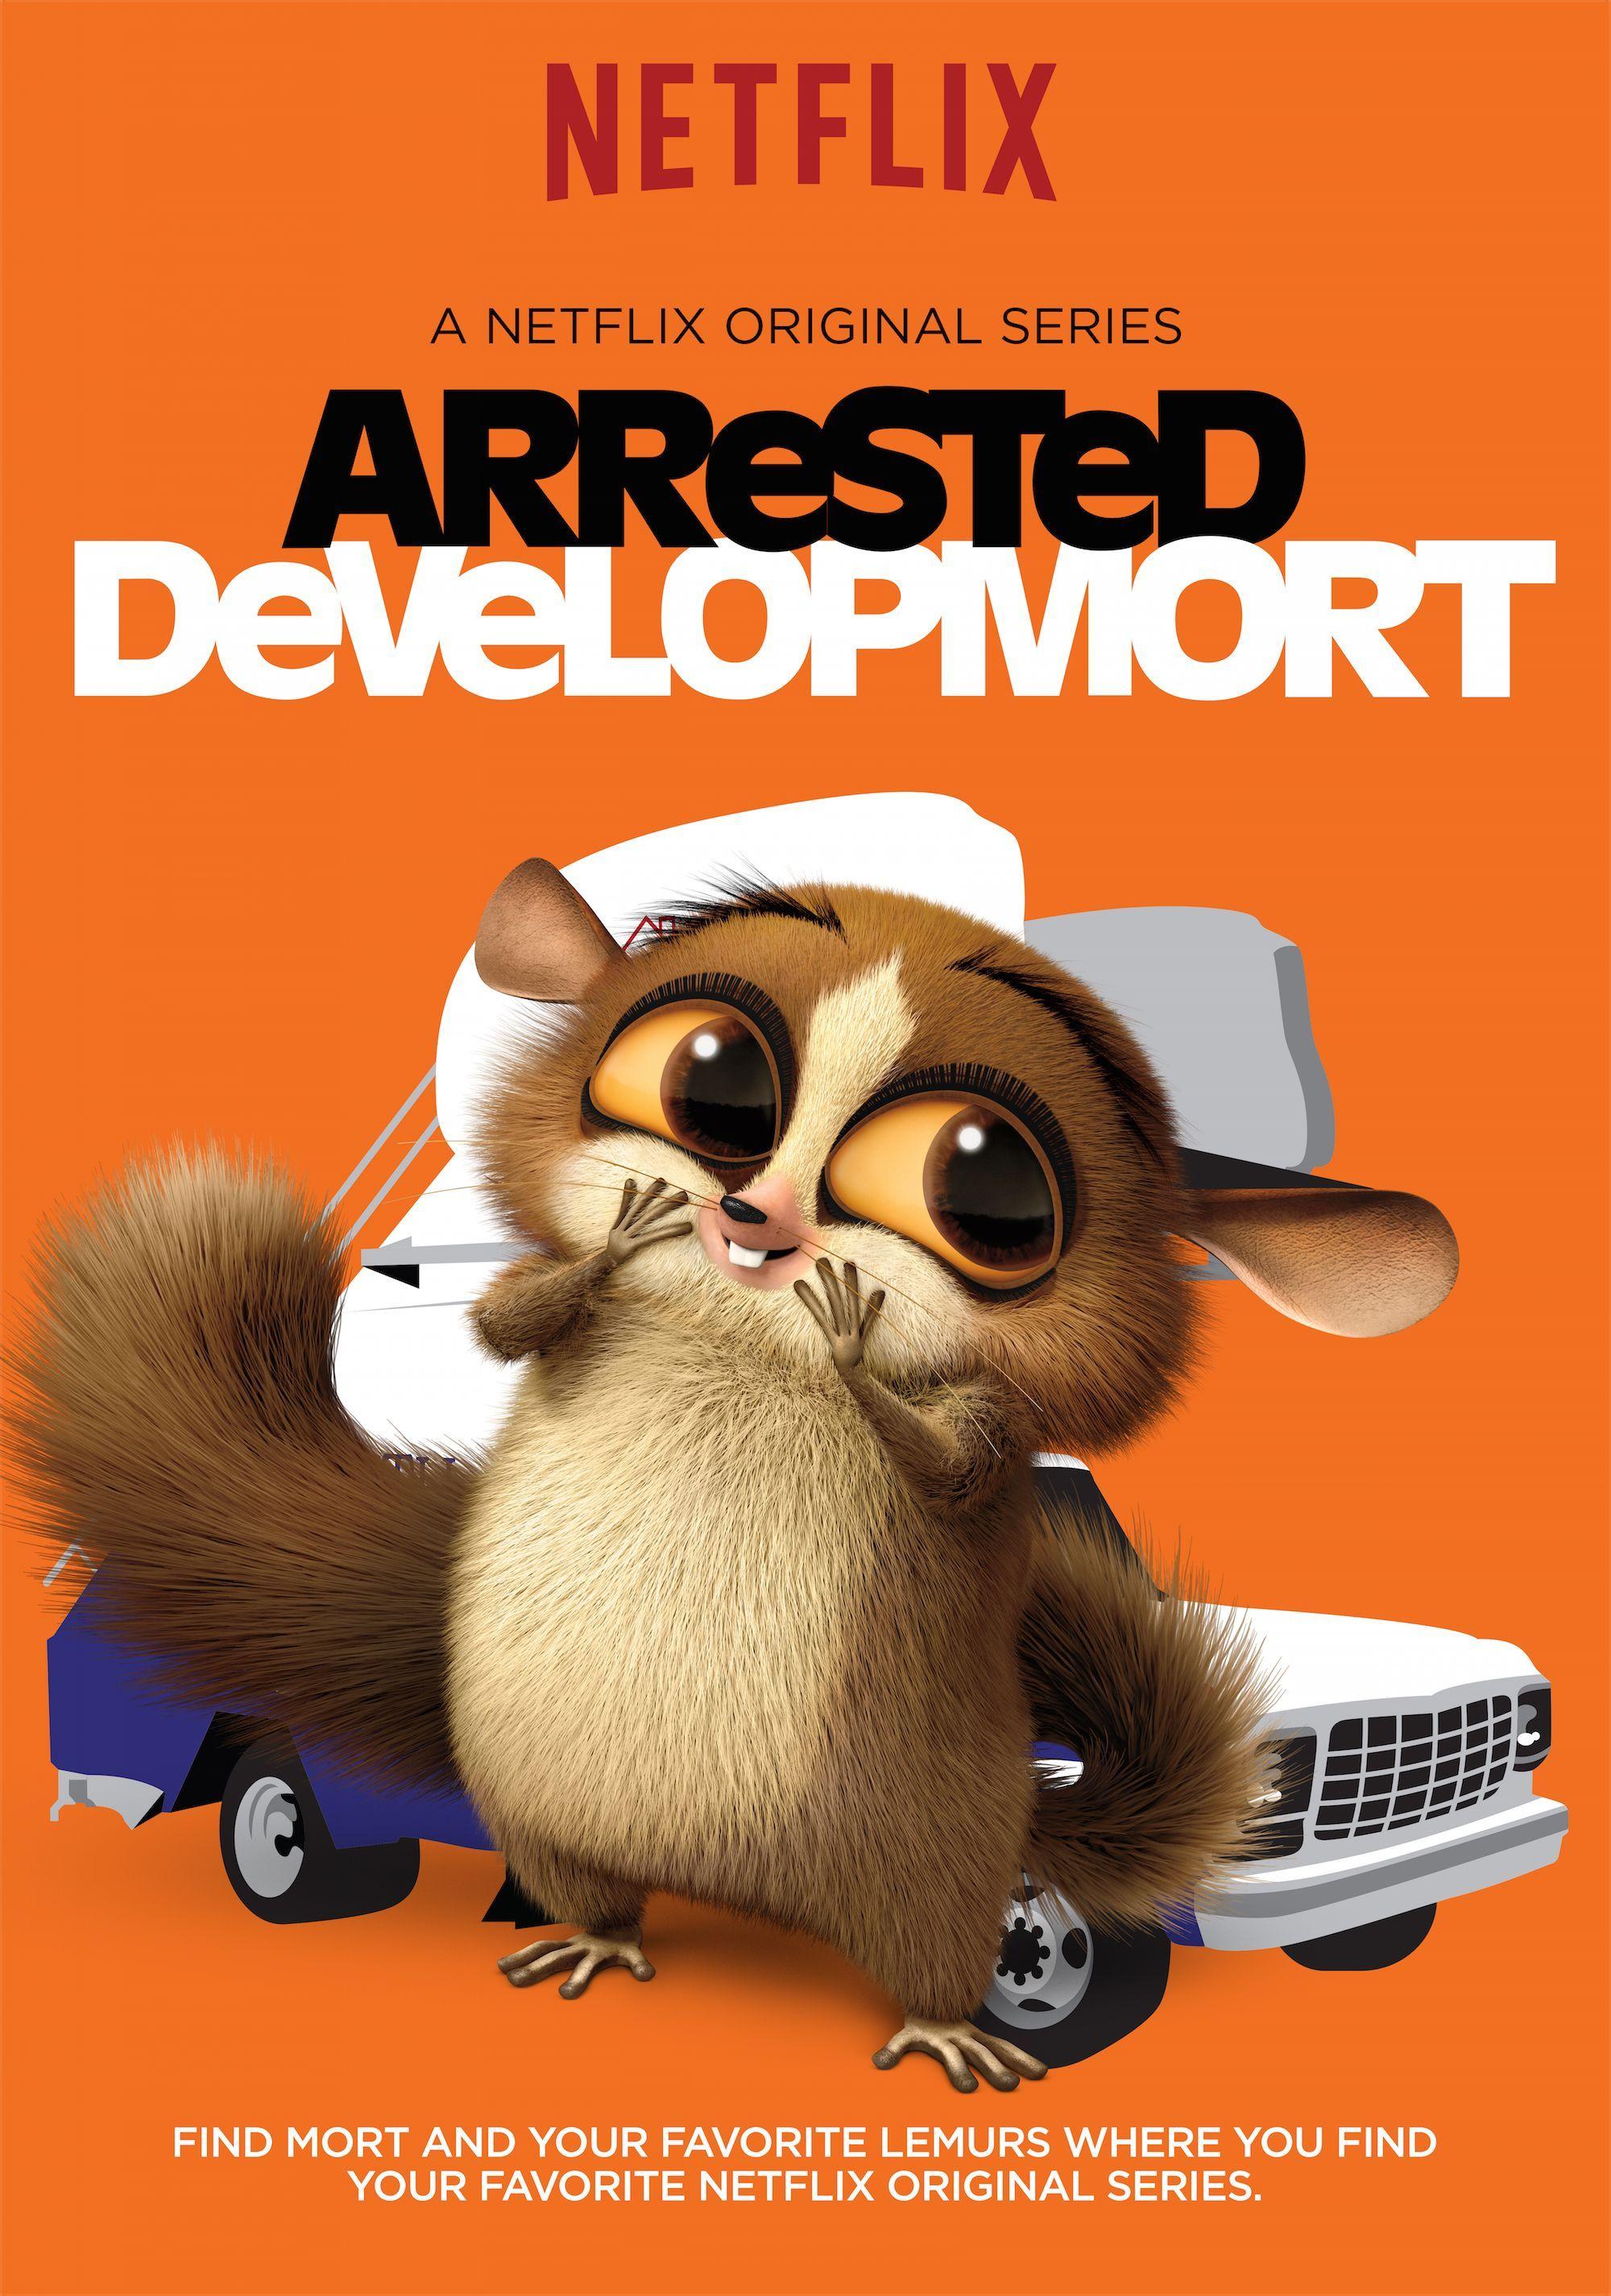 Tobias has catlike agility. Netflix movies, Netflix